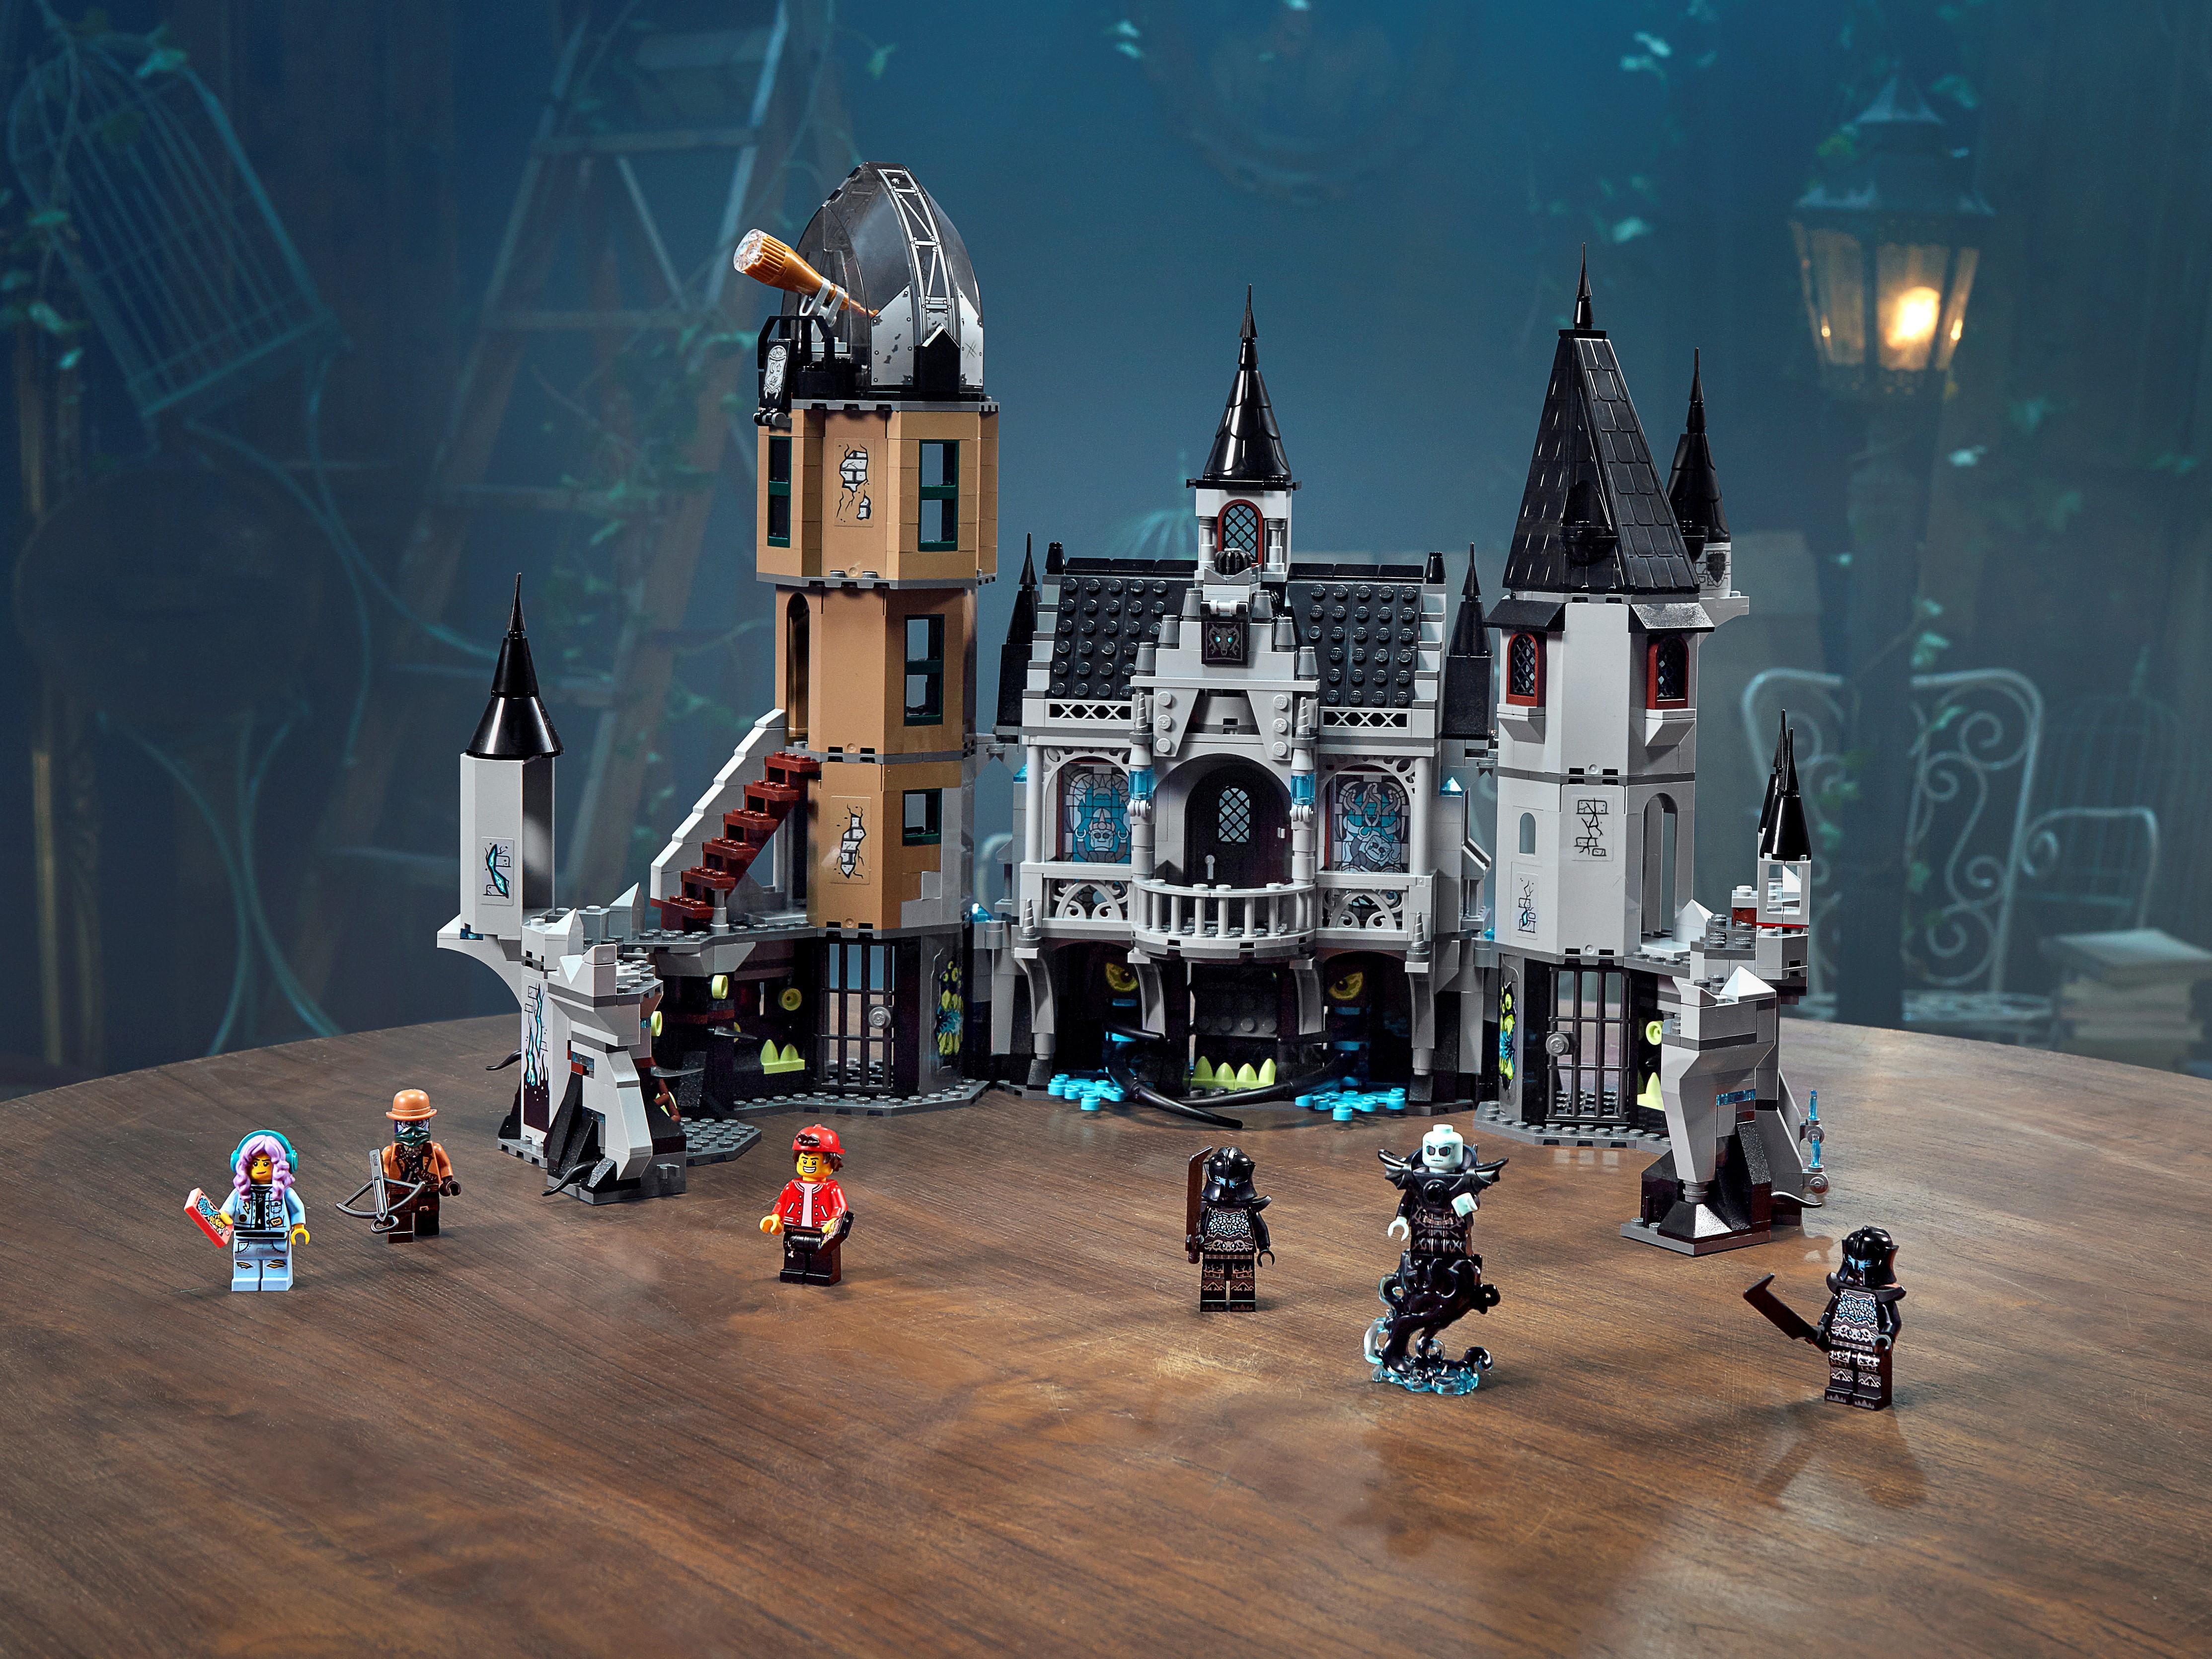 Mystery Castle